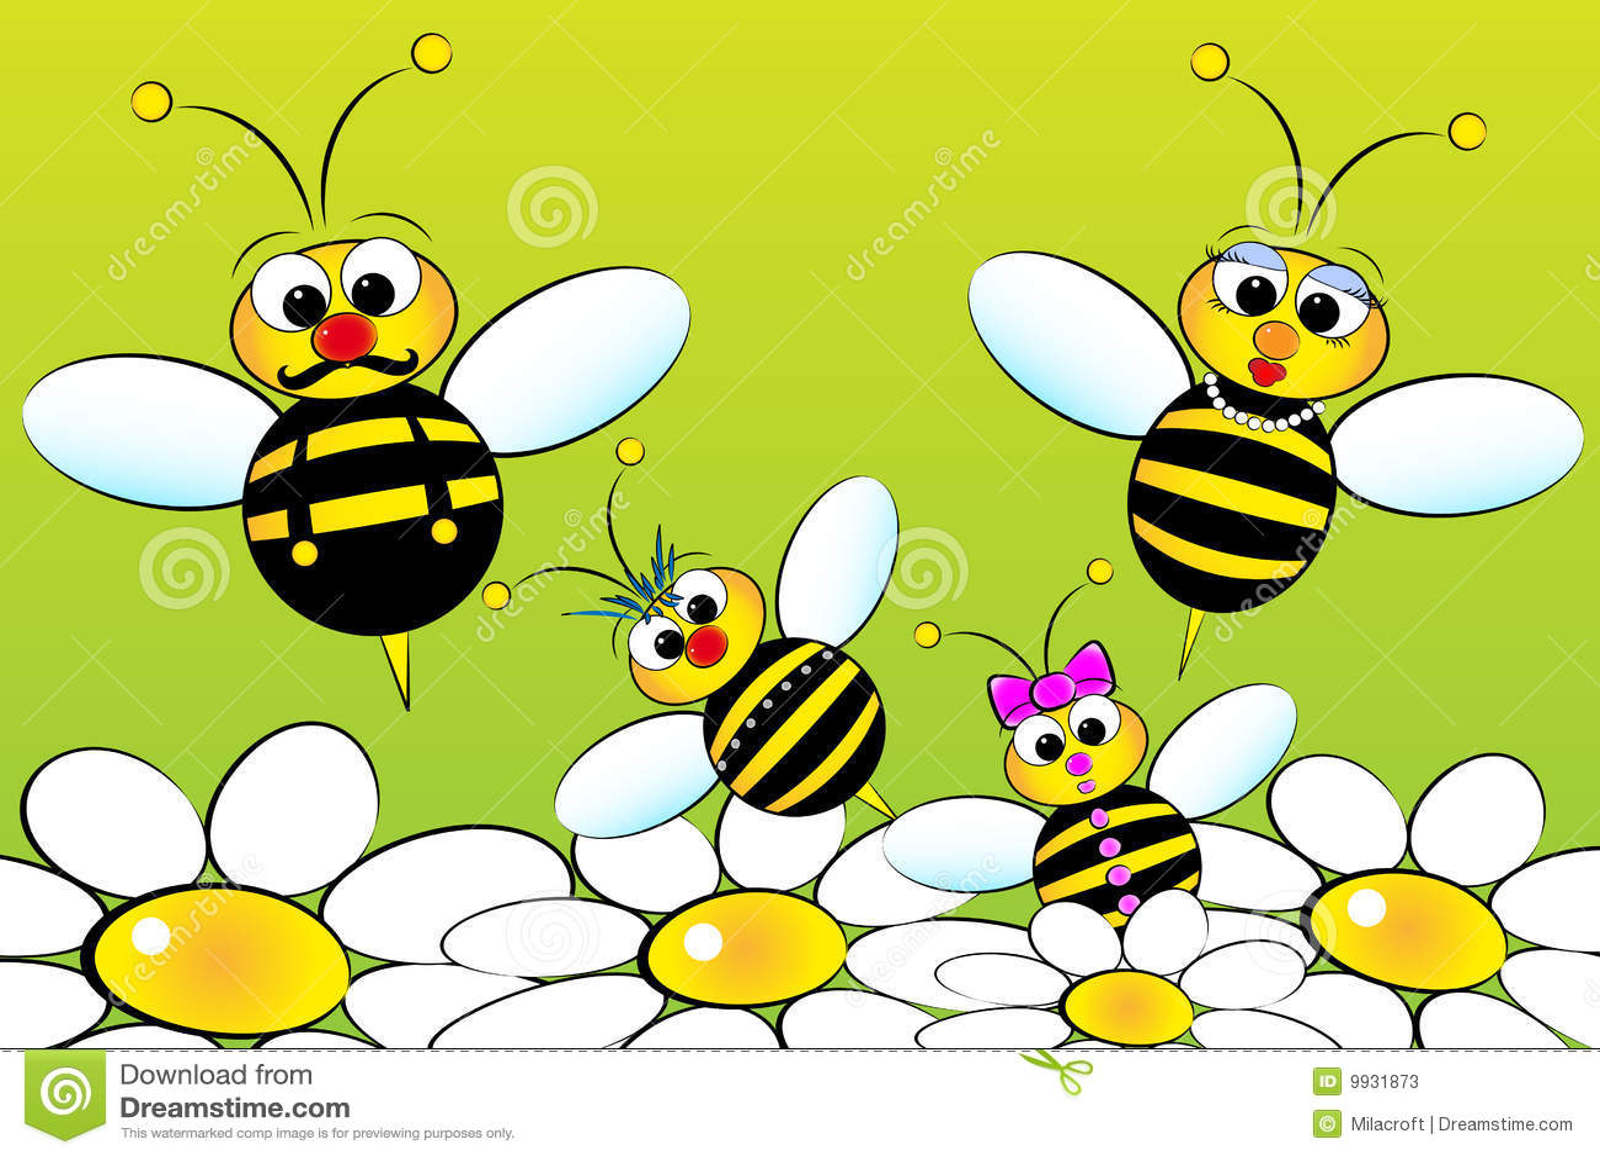 Bees family kids illustration stock vector for Immagini di api per bambini